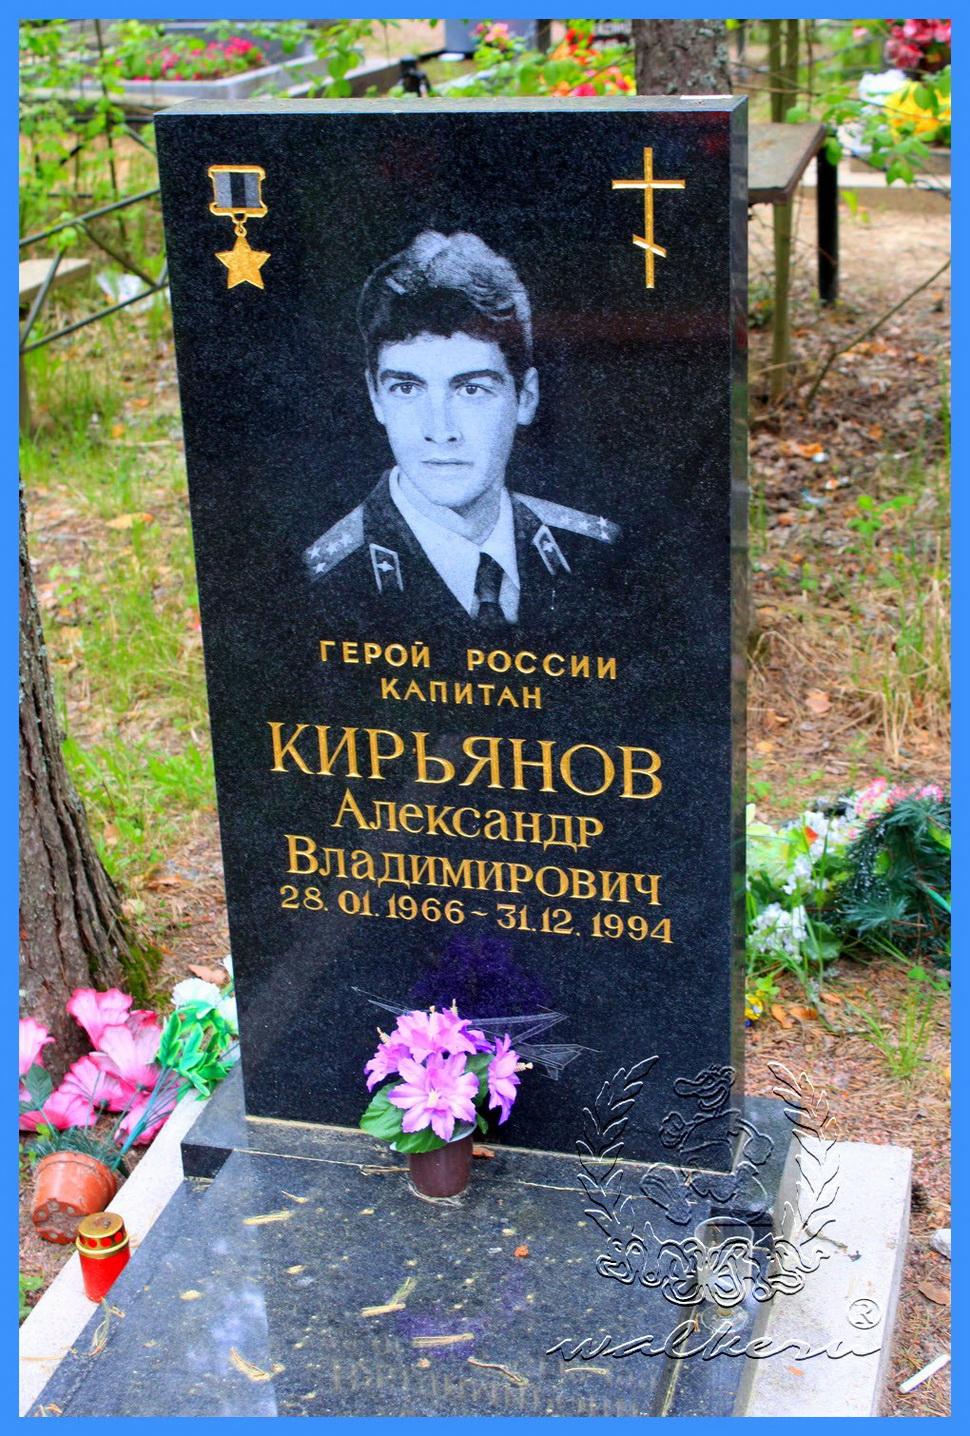 Кирьянов Александр Владимирович